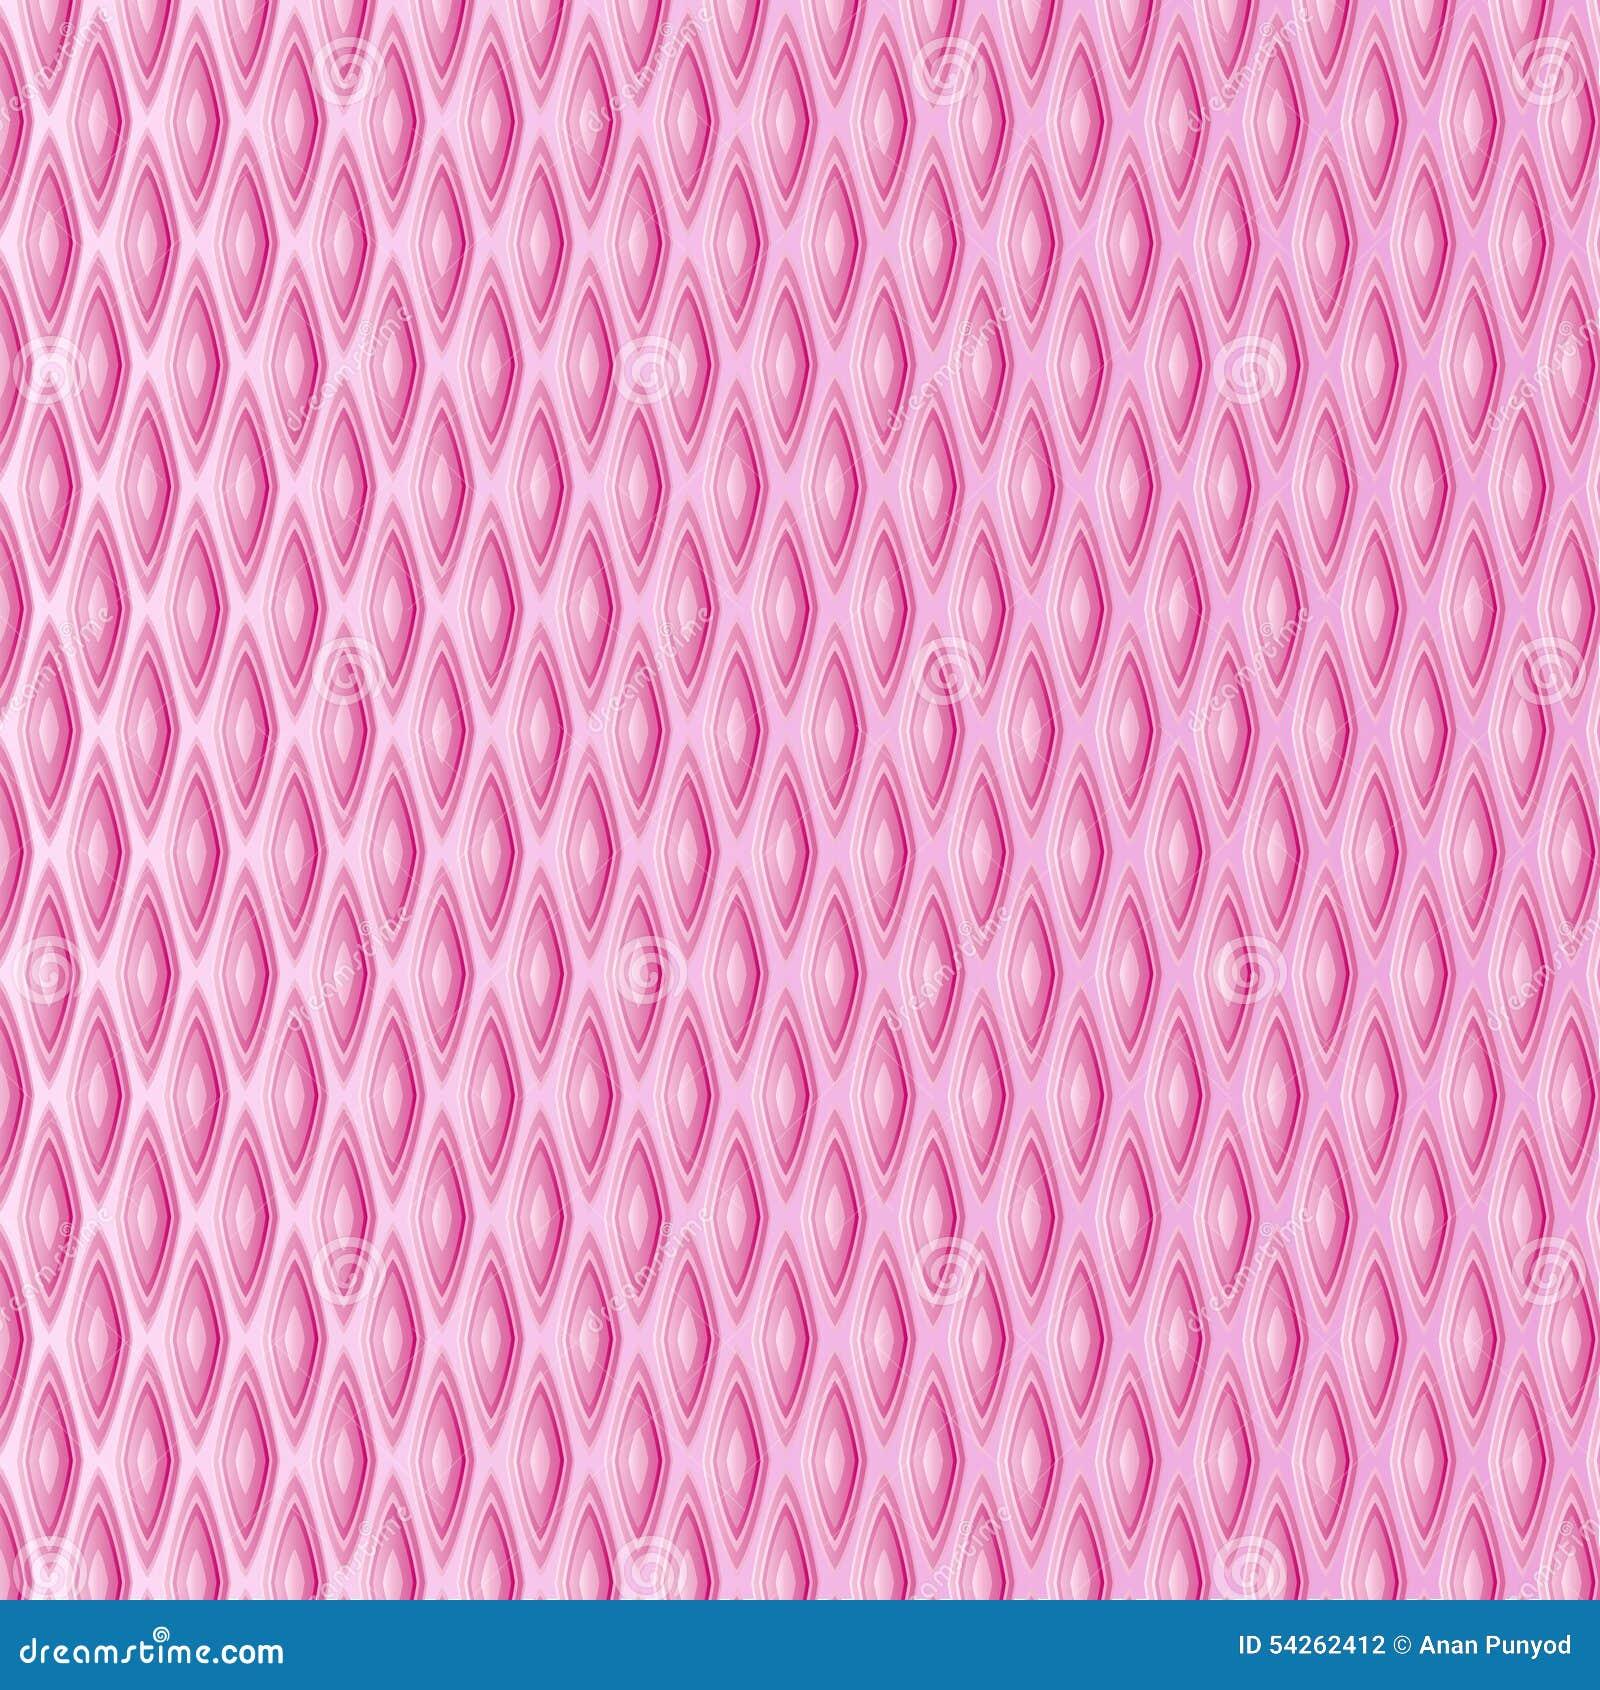 Pink Diamond Mesh Abstract Background Vector Art Design